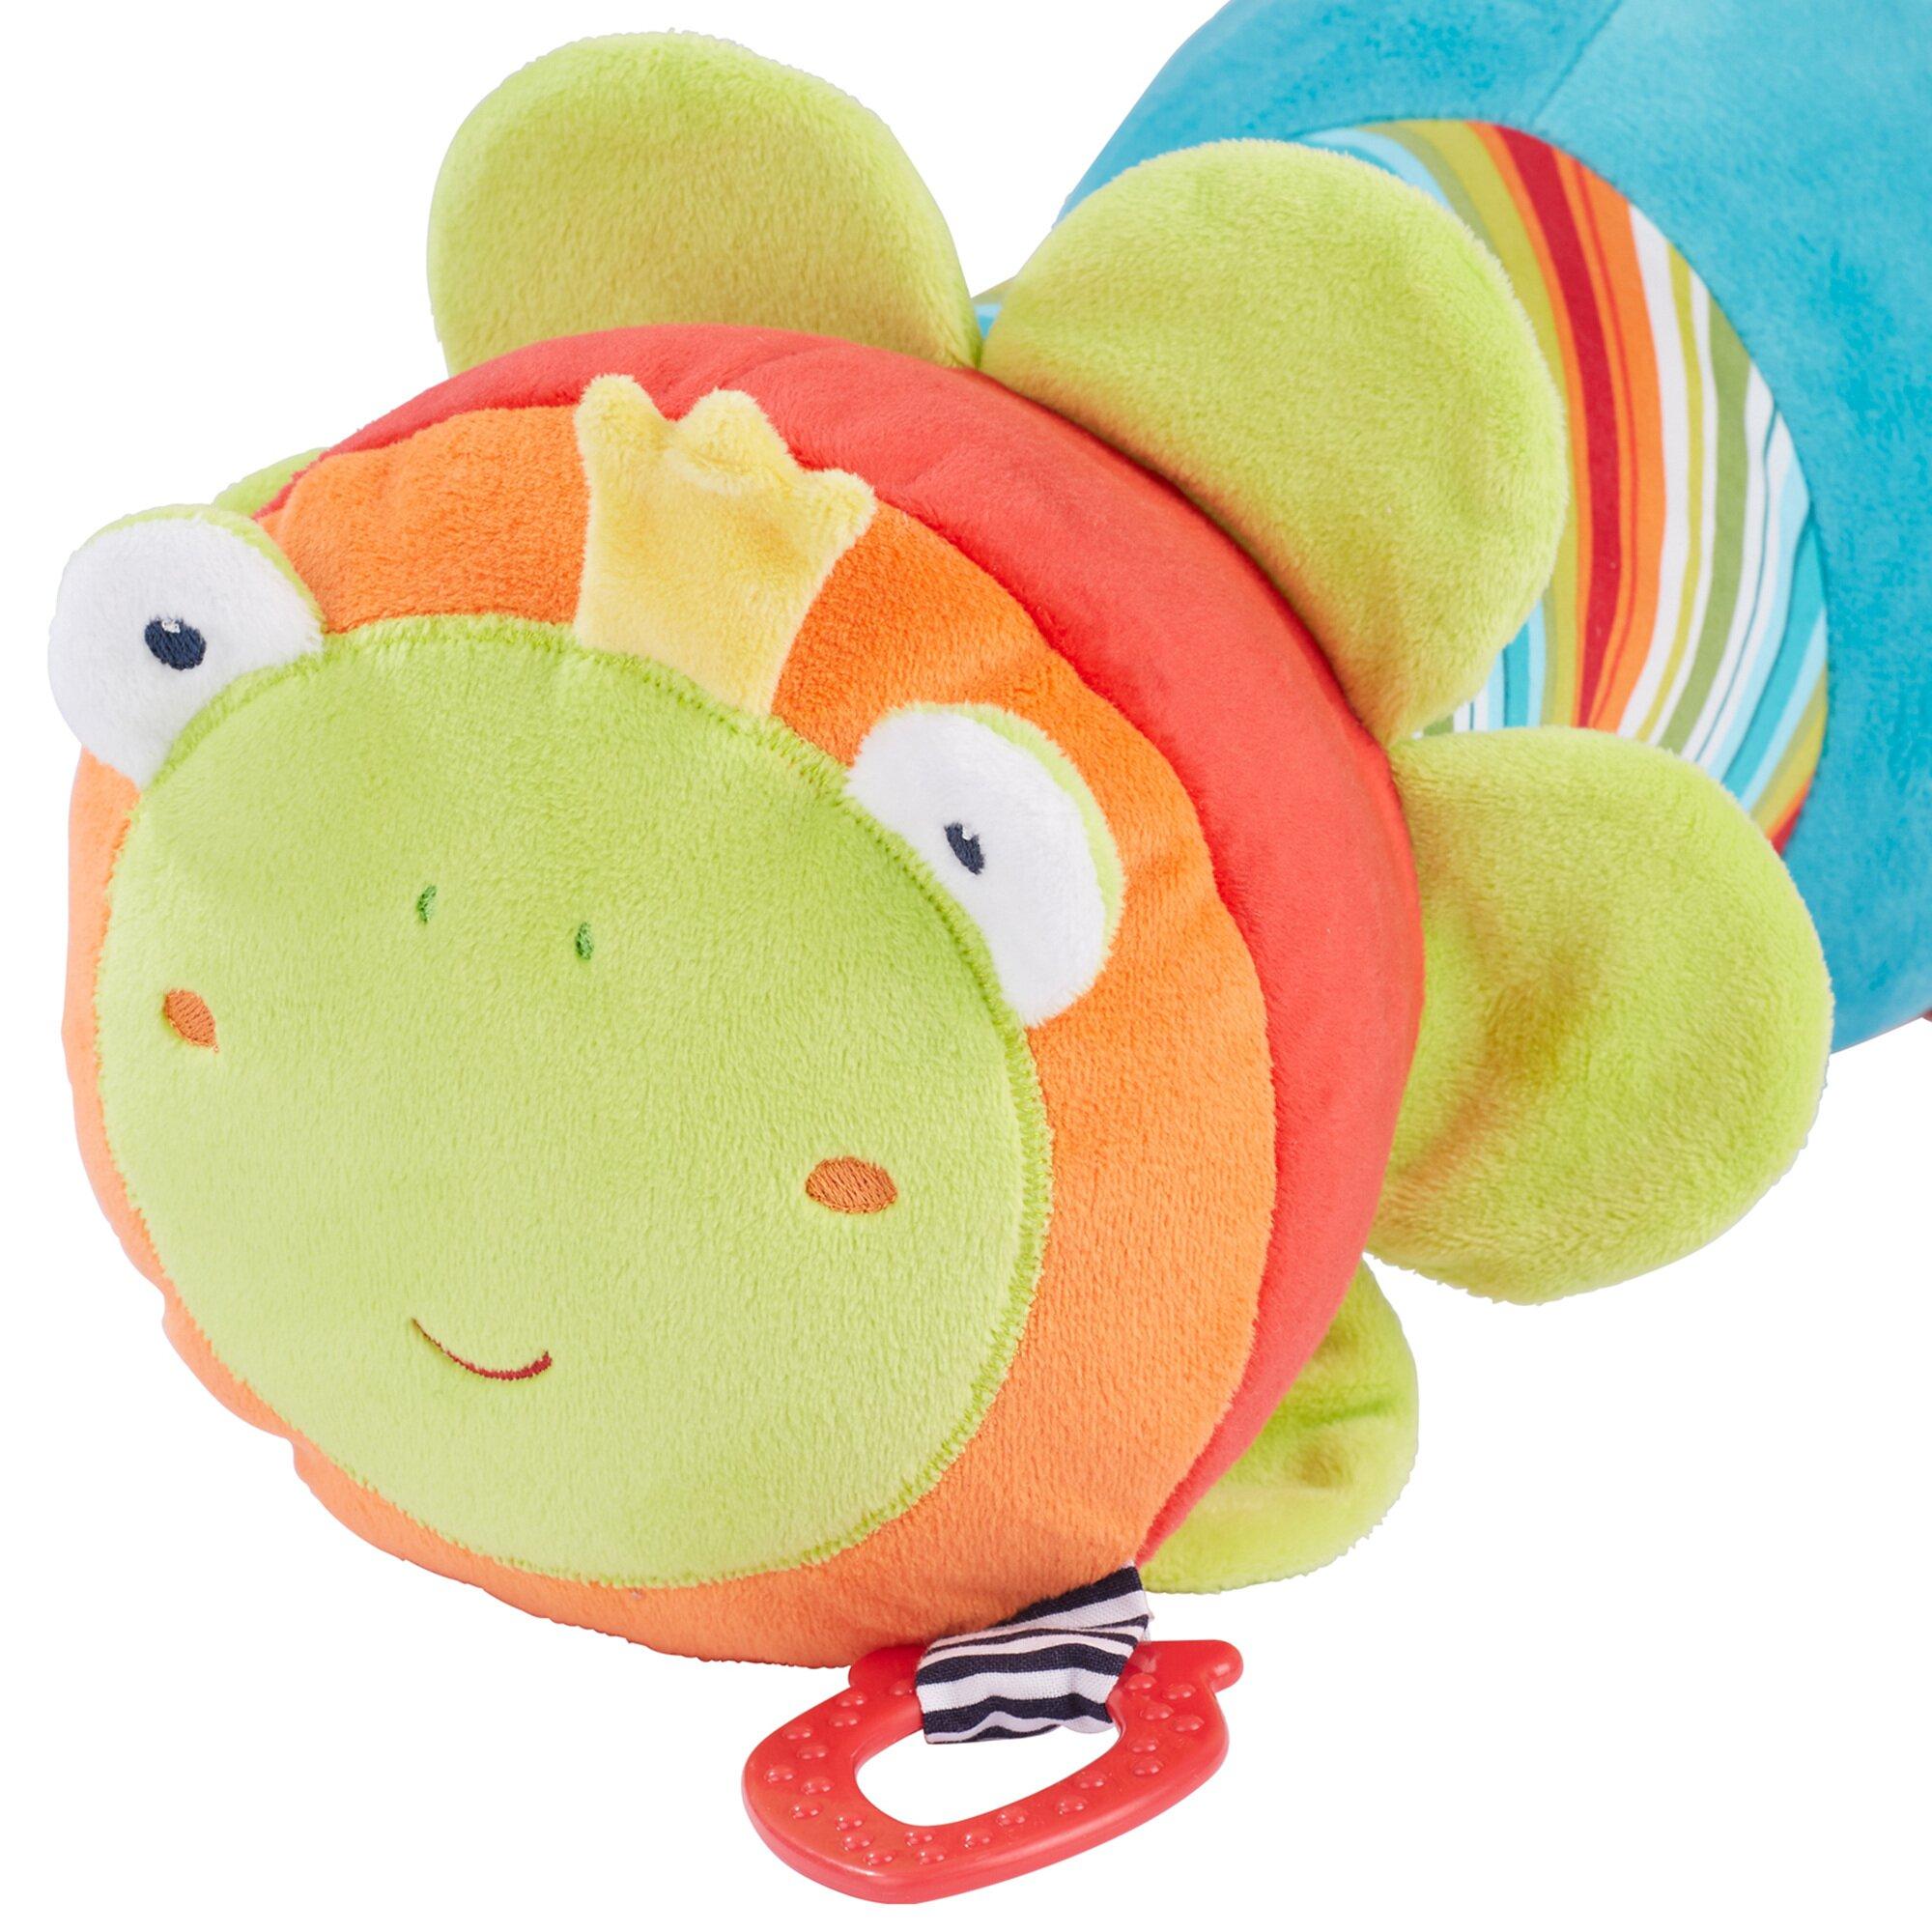 solini-krabbelrolle-froschkonig